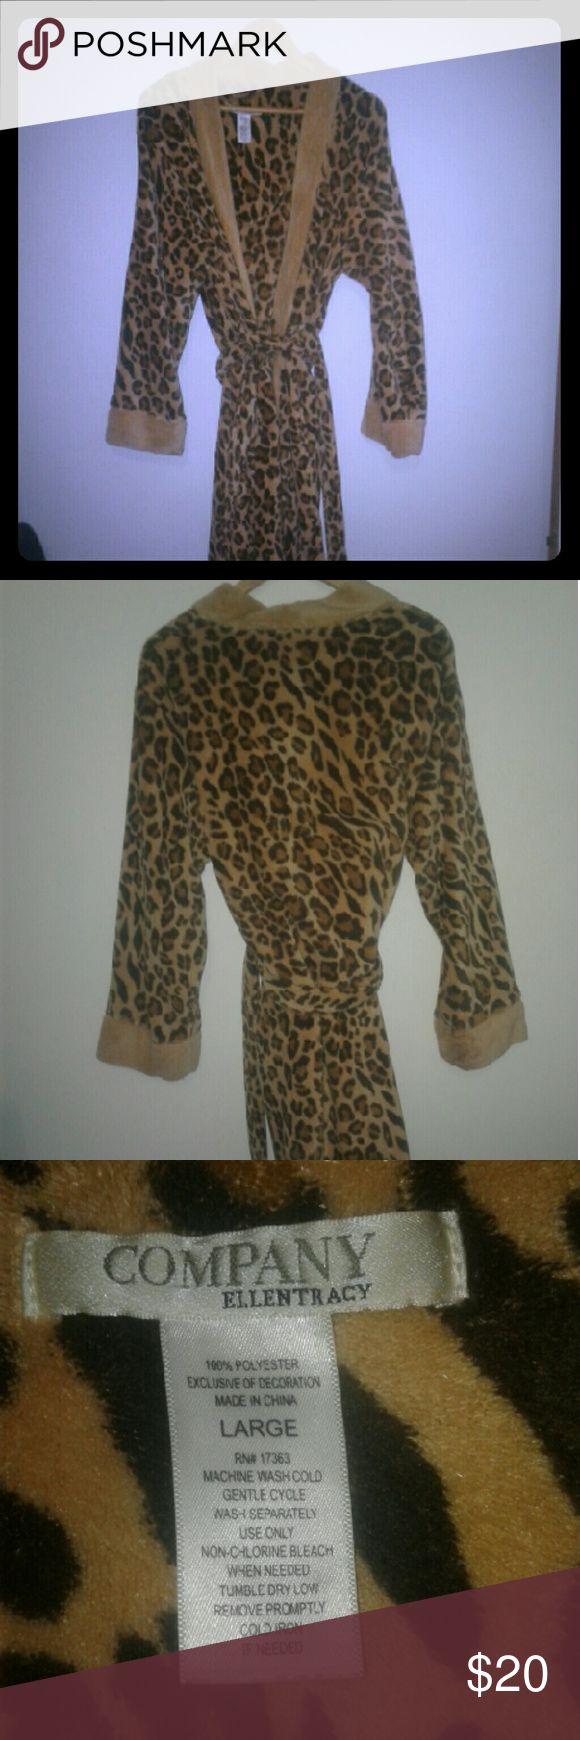 ELLEN TRACY cheetah print robe Very warm and comfortable robe. NWOT Ellen Tracy Intimates & Sleepwear Robes